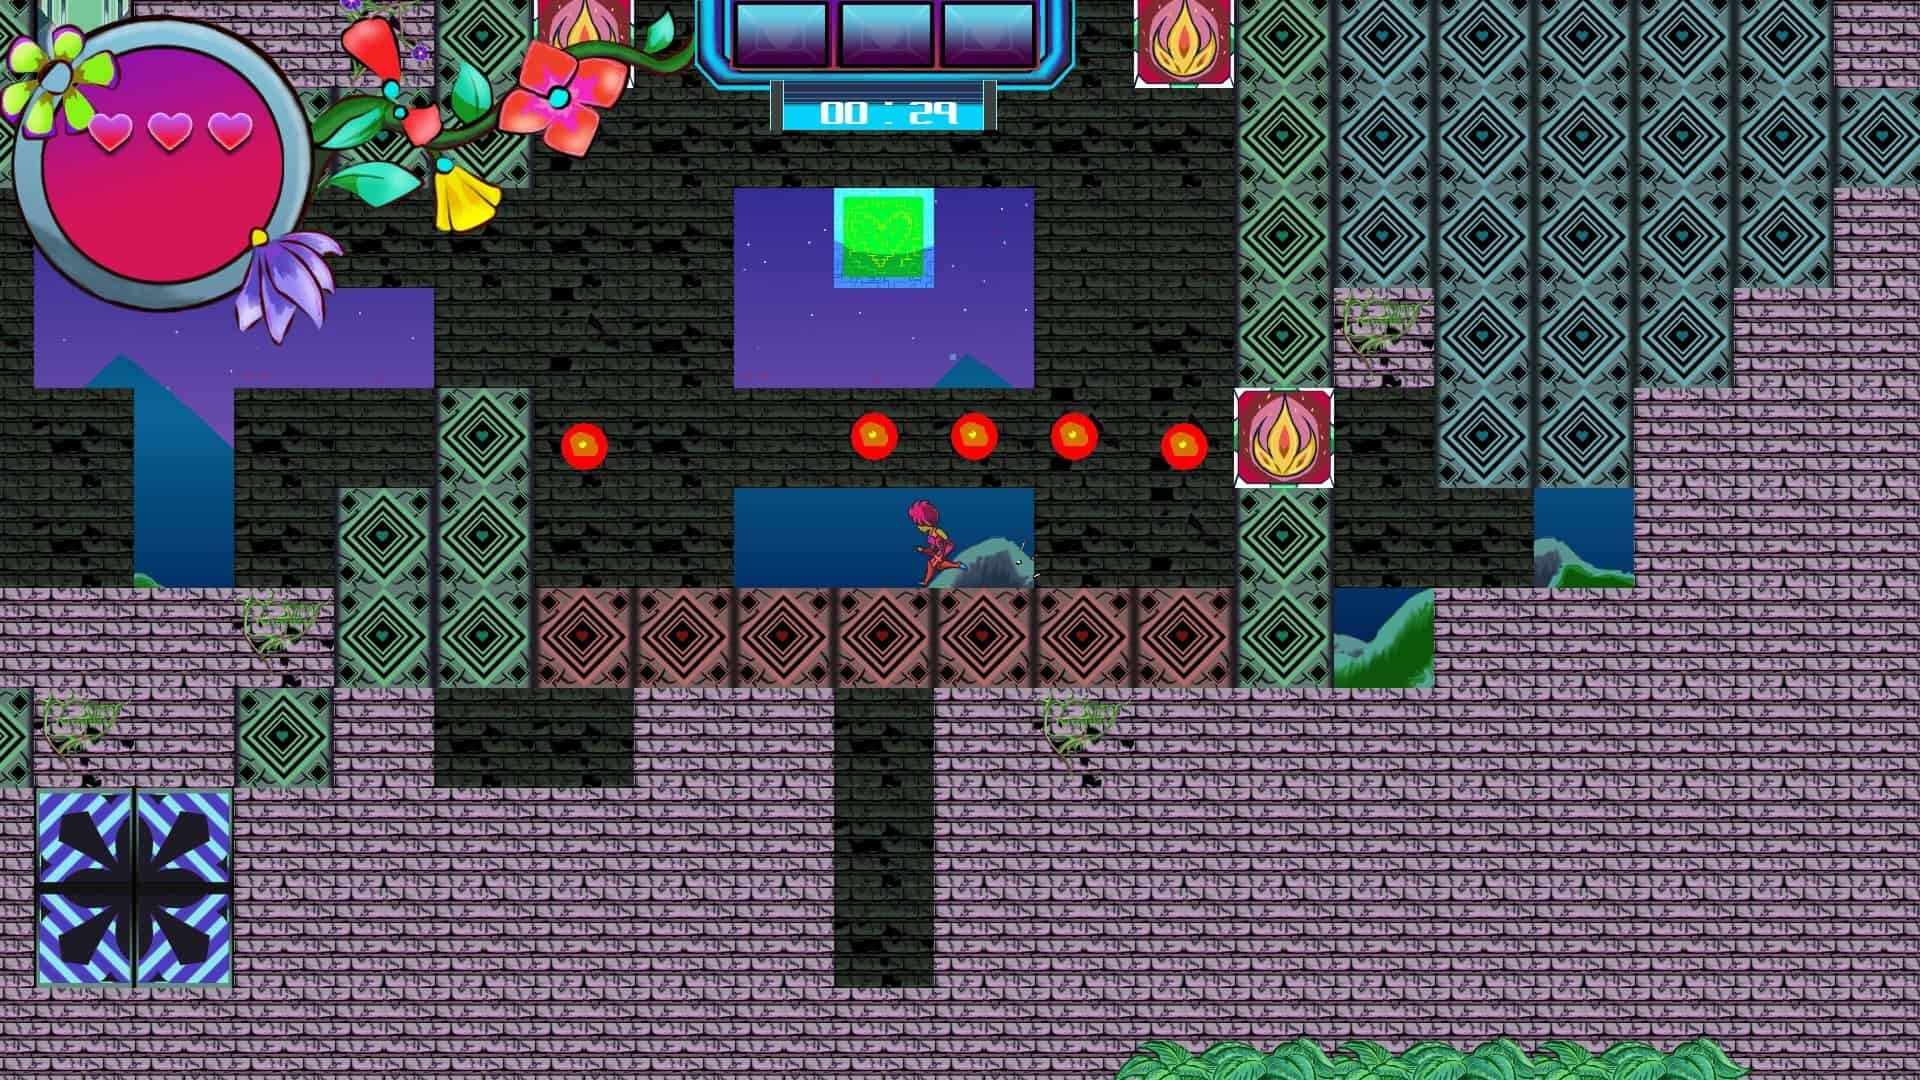 PulseCharge game screenshot, flamethrowers